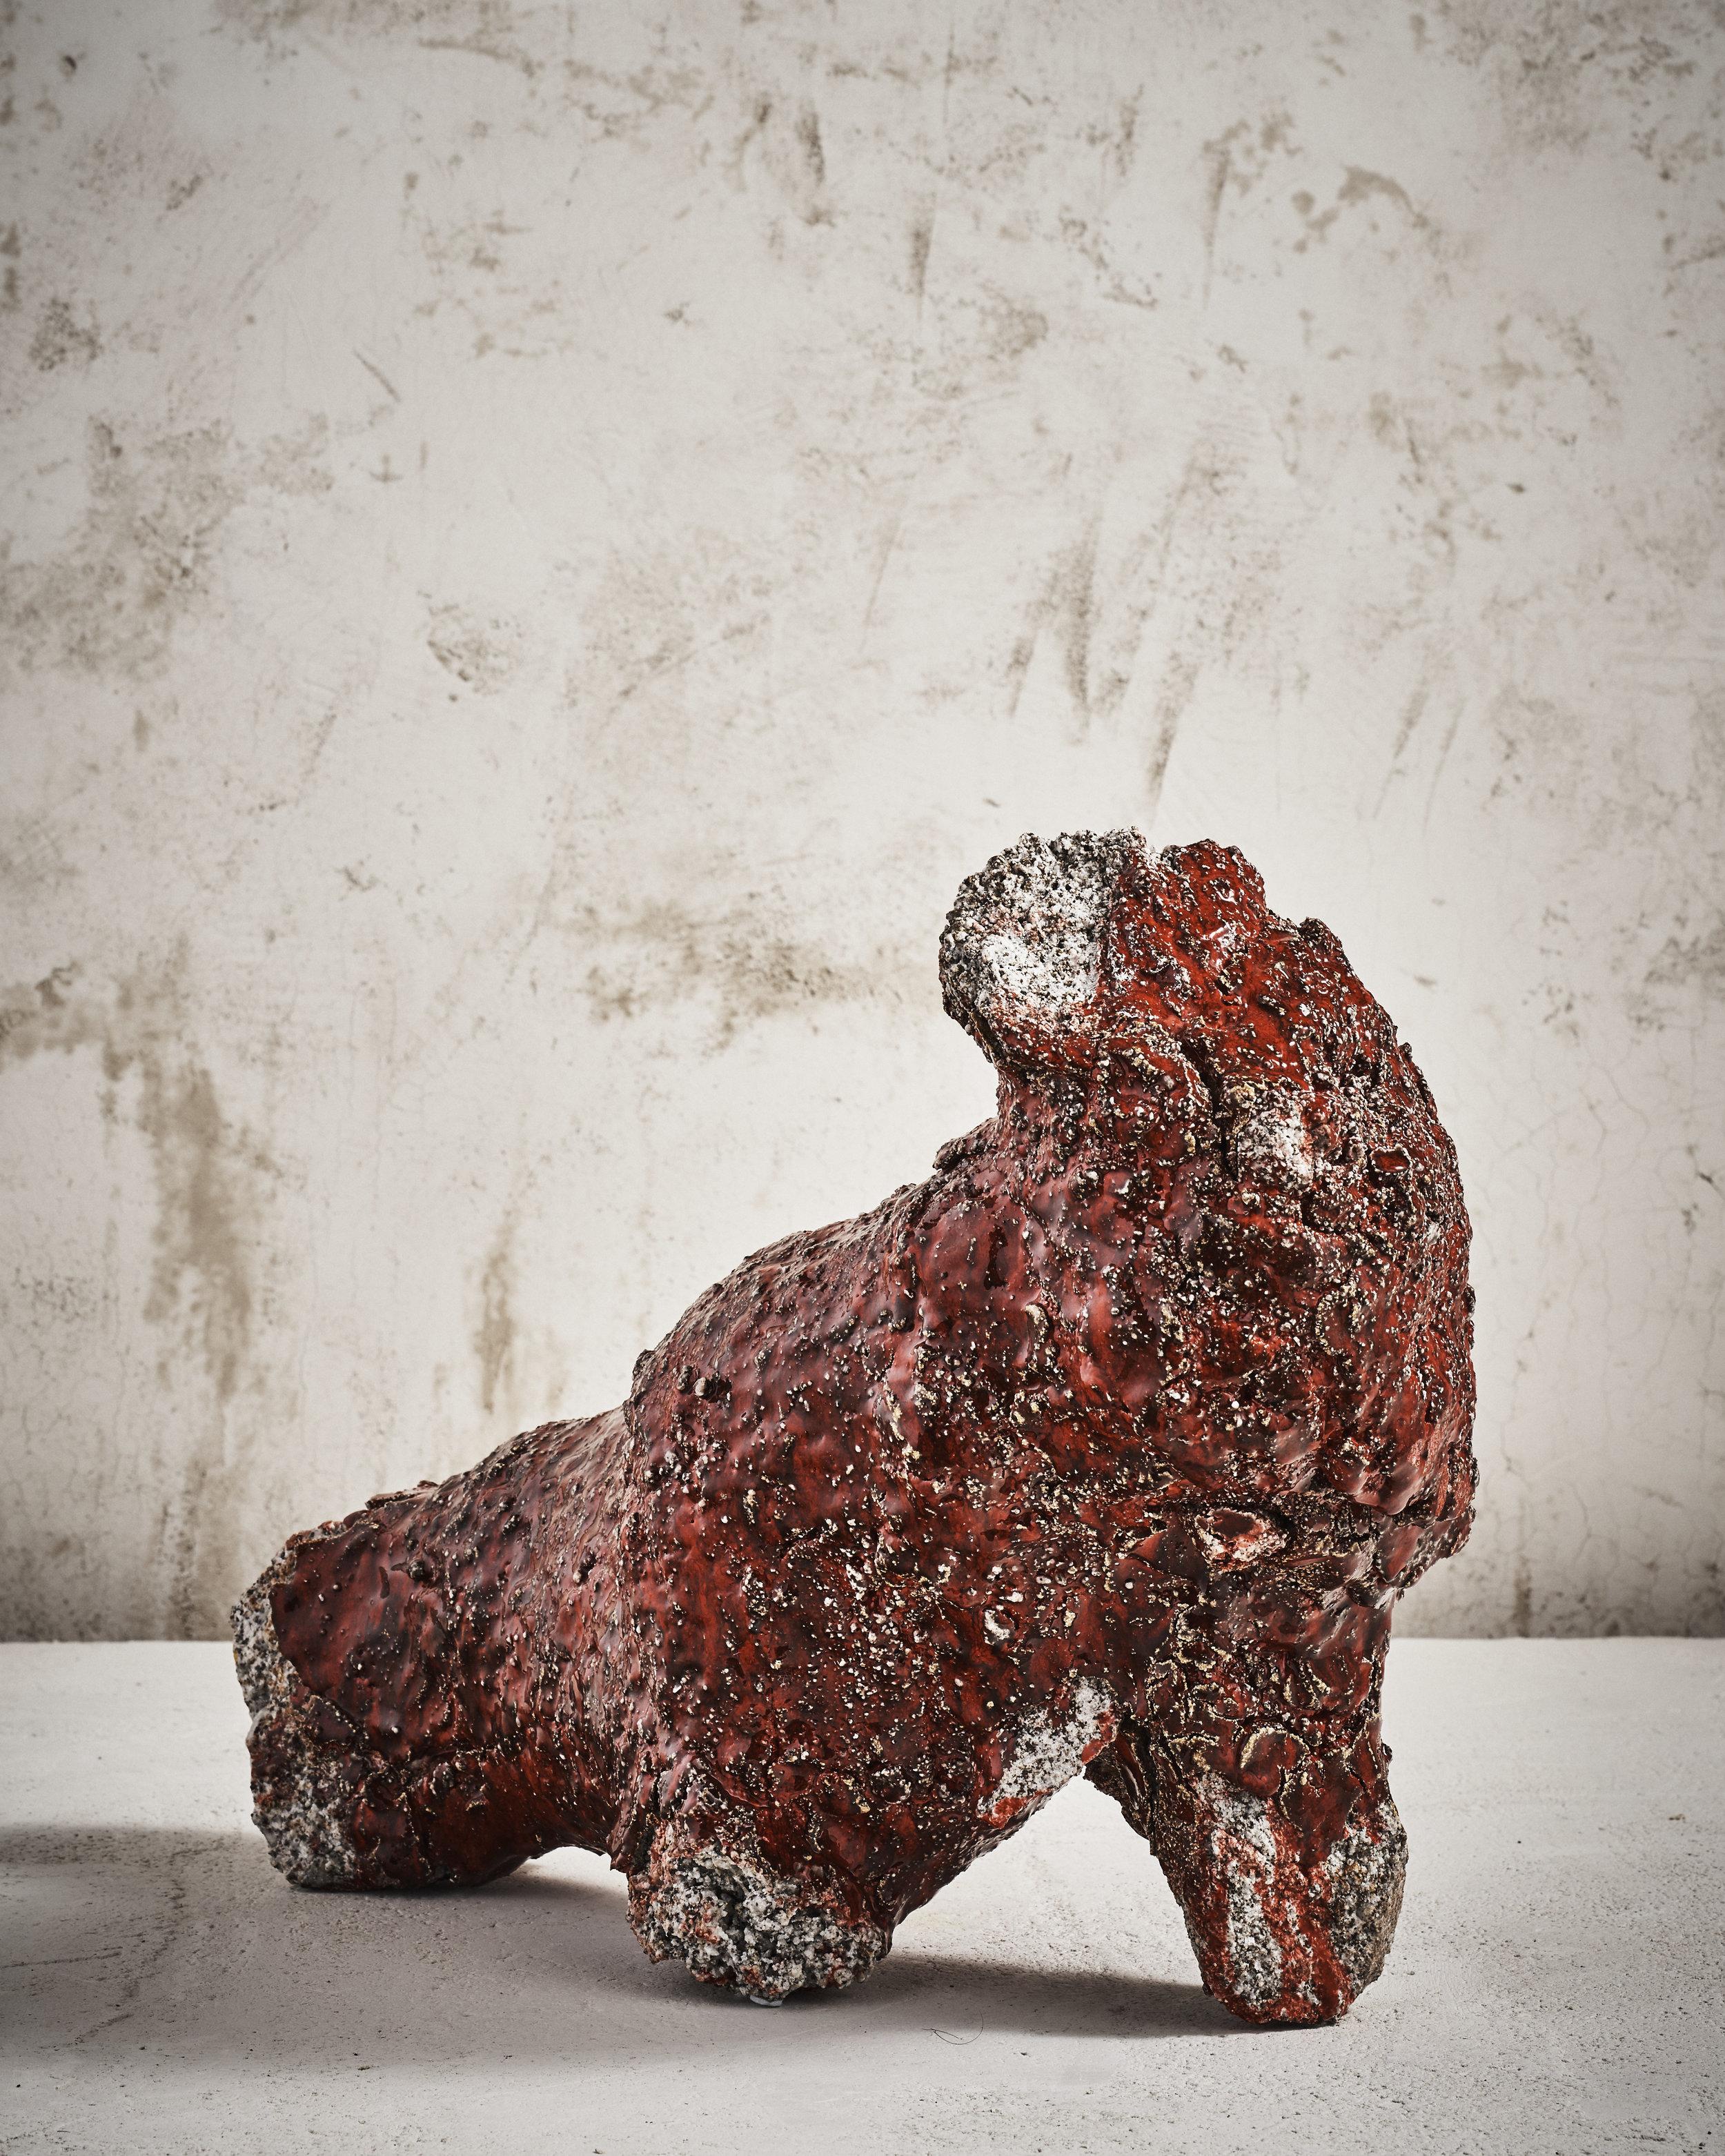 Aneta Regel, Red Form, 2013